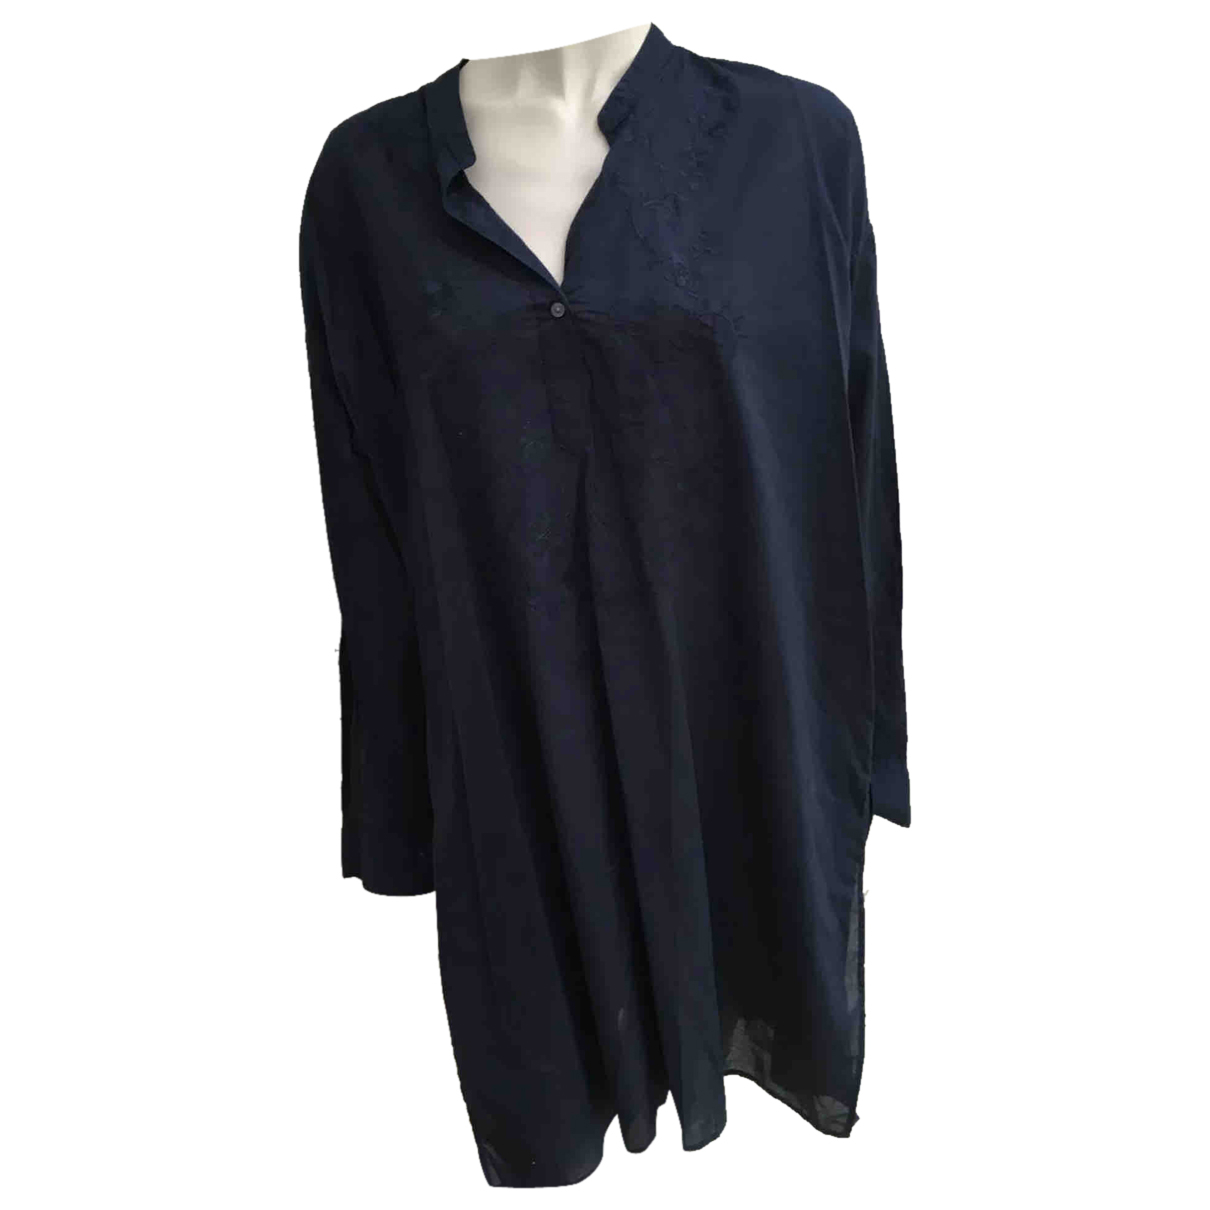 Uniqlo N Navy Cotton  top for Women XL International